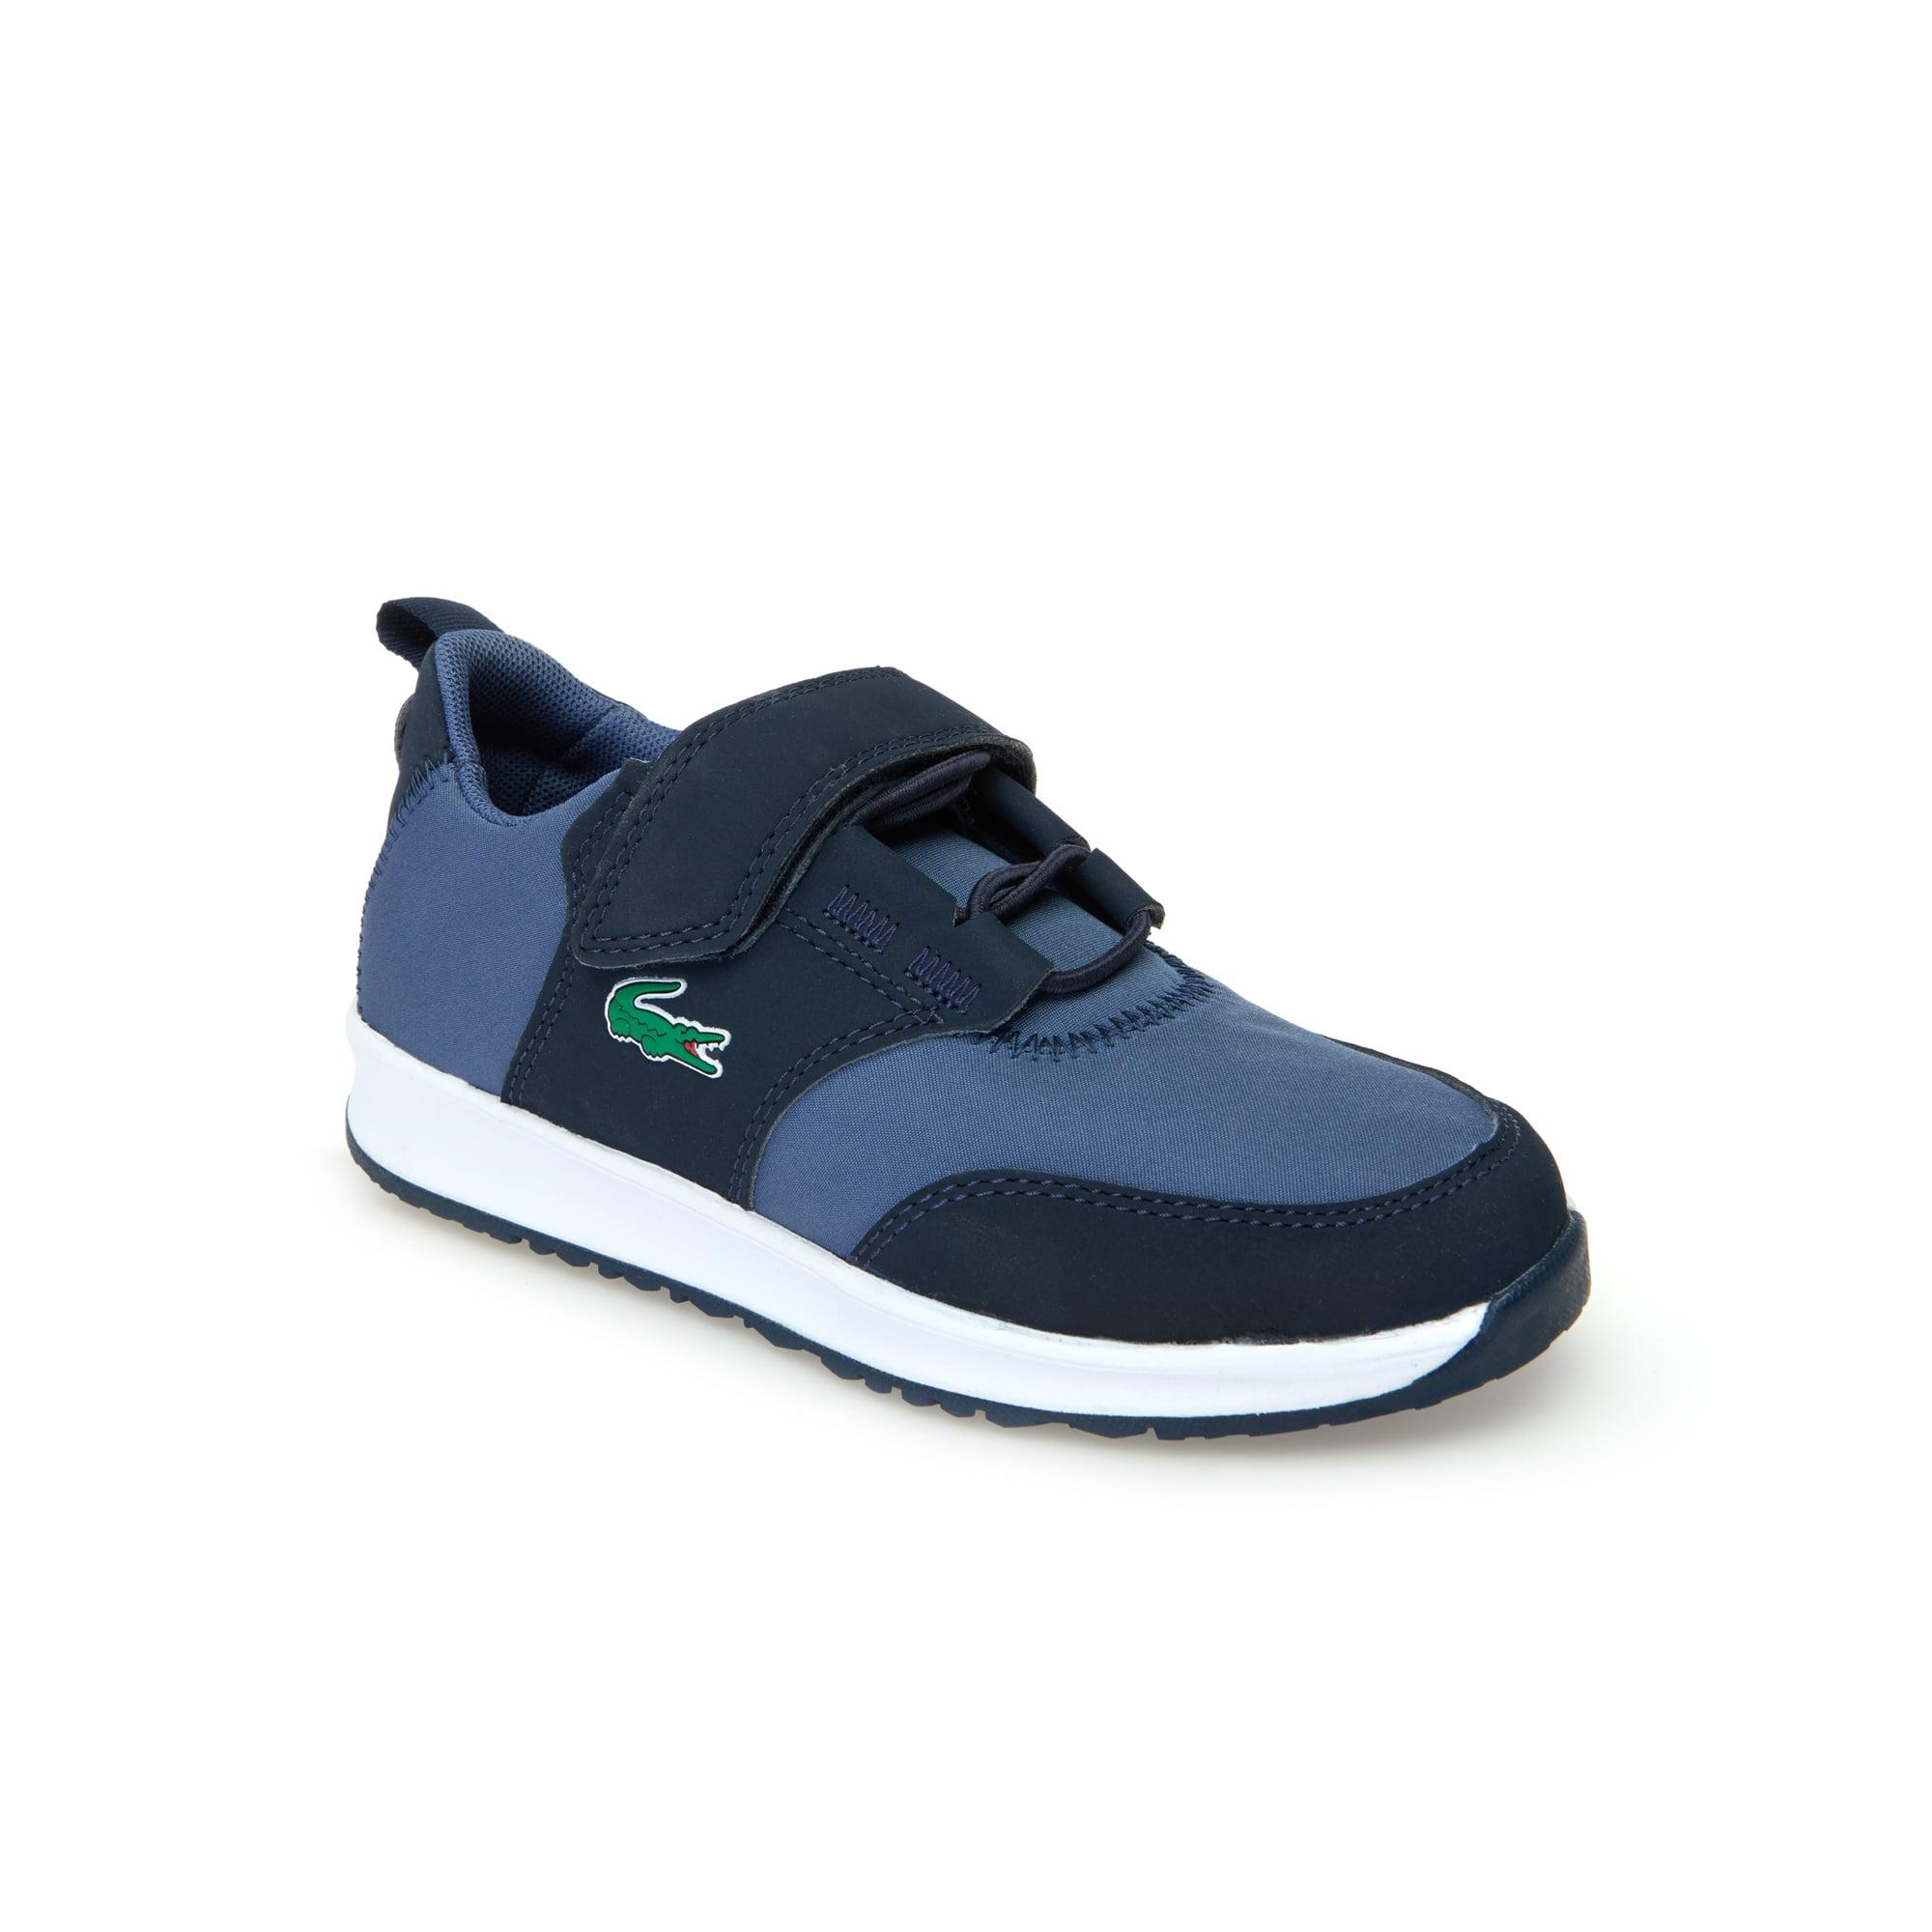 Kinder-Sneakers L.IGHT aus Textil und Synthetik